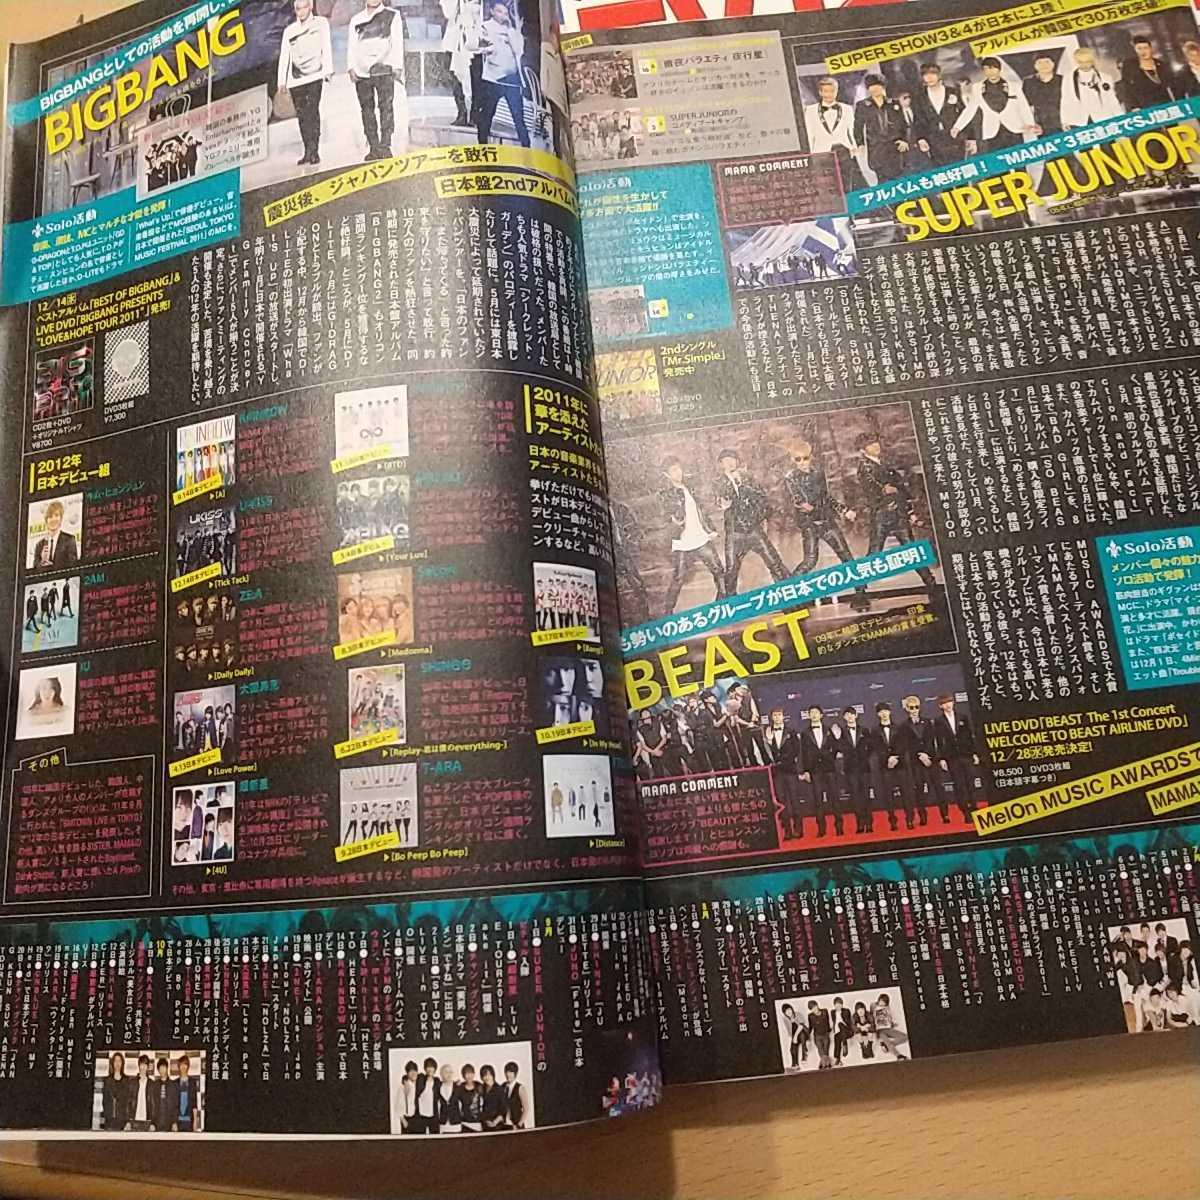 TVガイド 関東版 2011-2012 お正月特大号 嵐 芦田愛菜 ワイド6面 ピンナップ 2PM K-POP Kis-My-Ft2 BIGBANG ジャニーズ